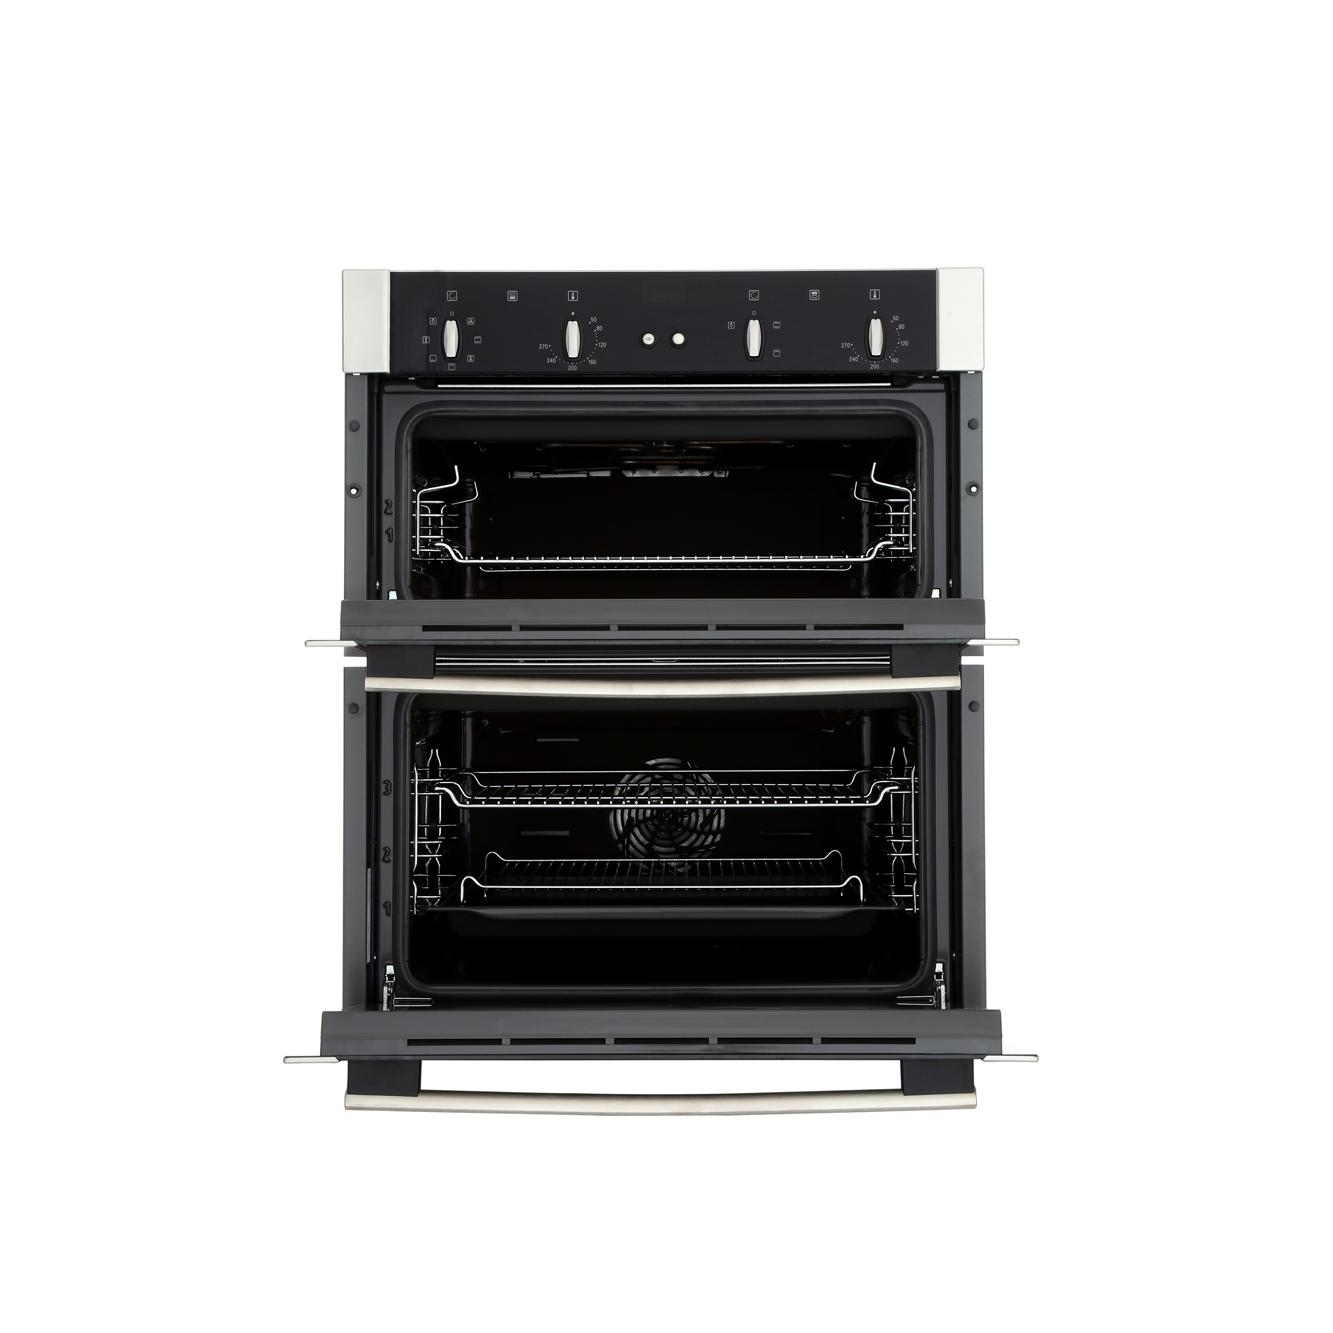 buy neff u17m42n5gb double built under electric oven. Black Bedroom Furniture Sets. Home Design Ideas